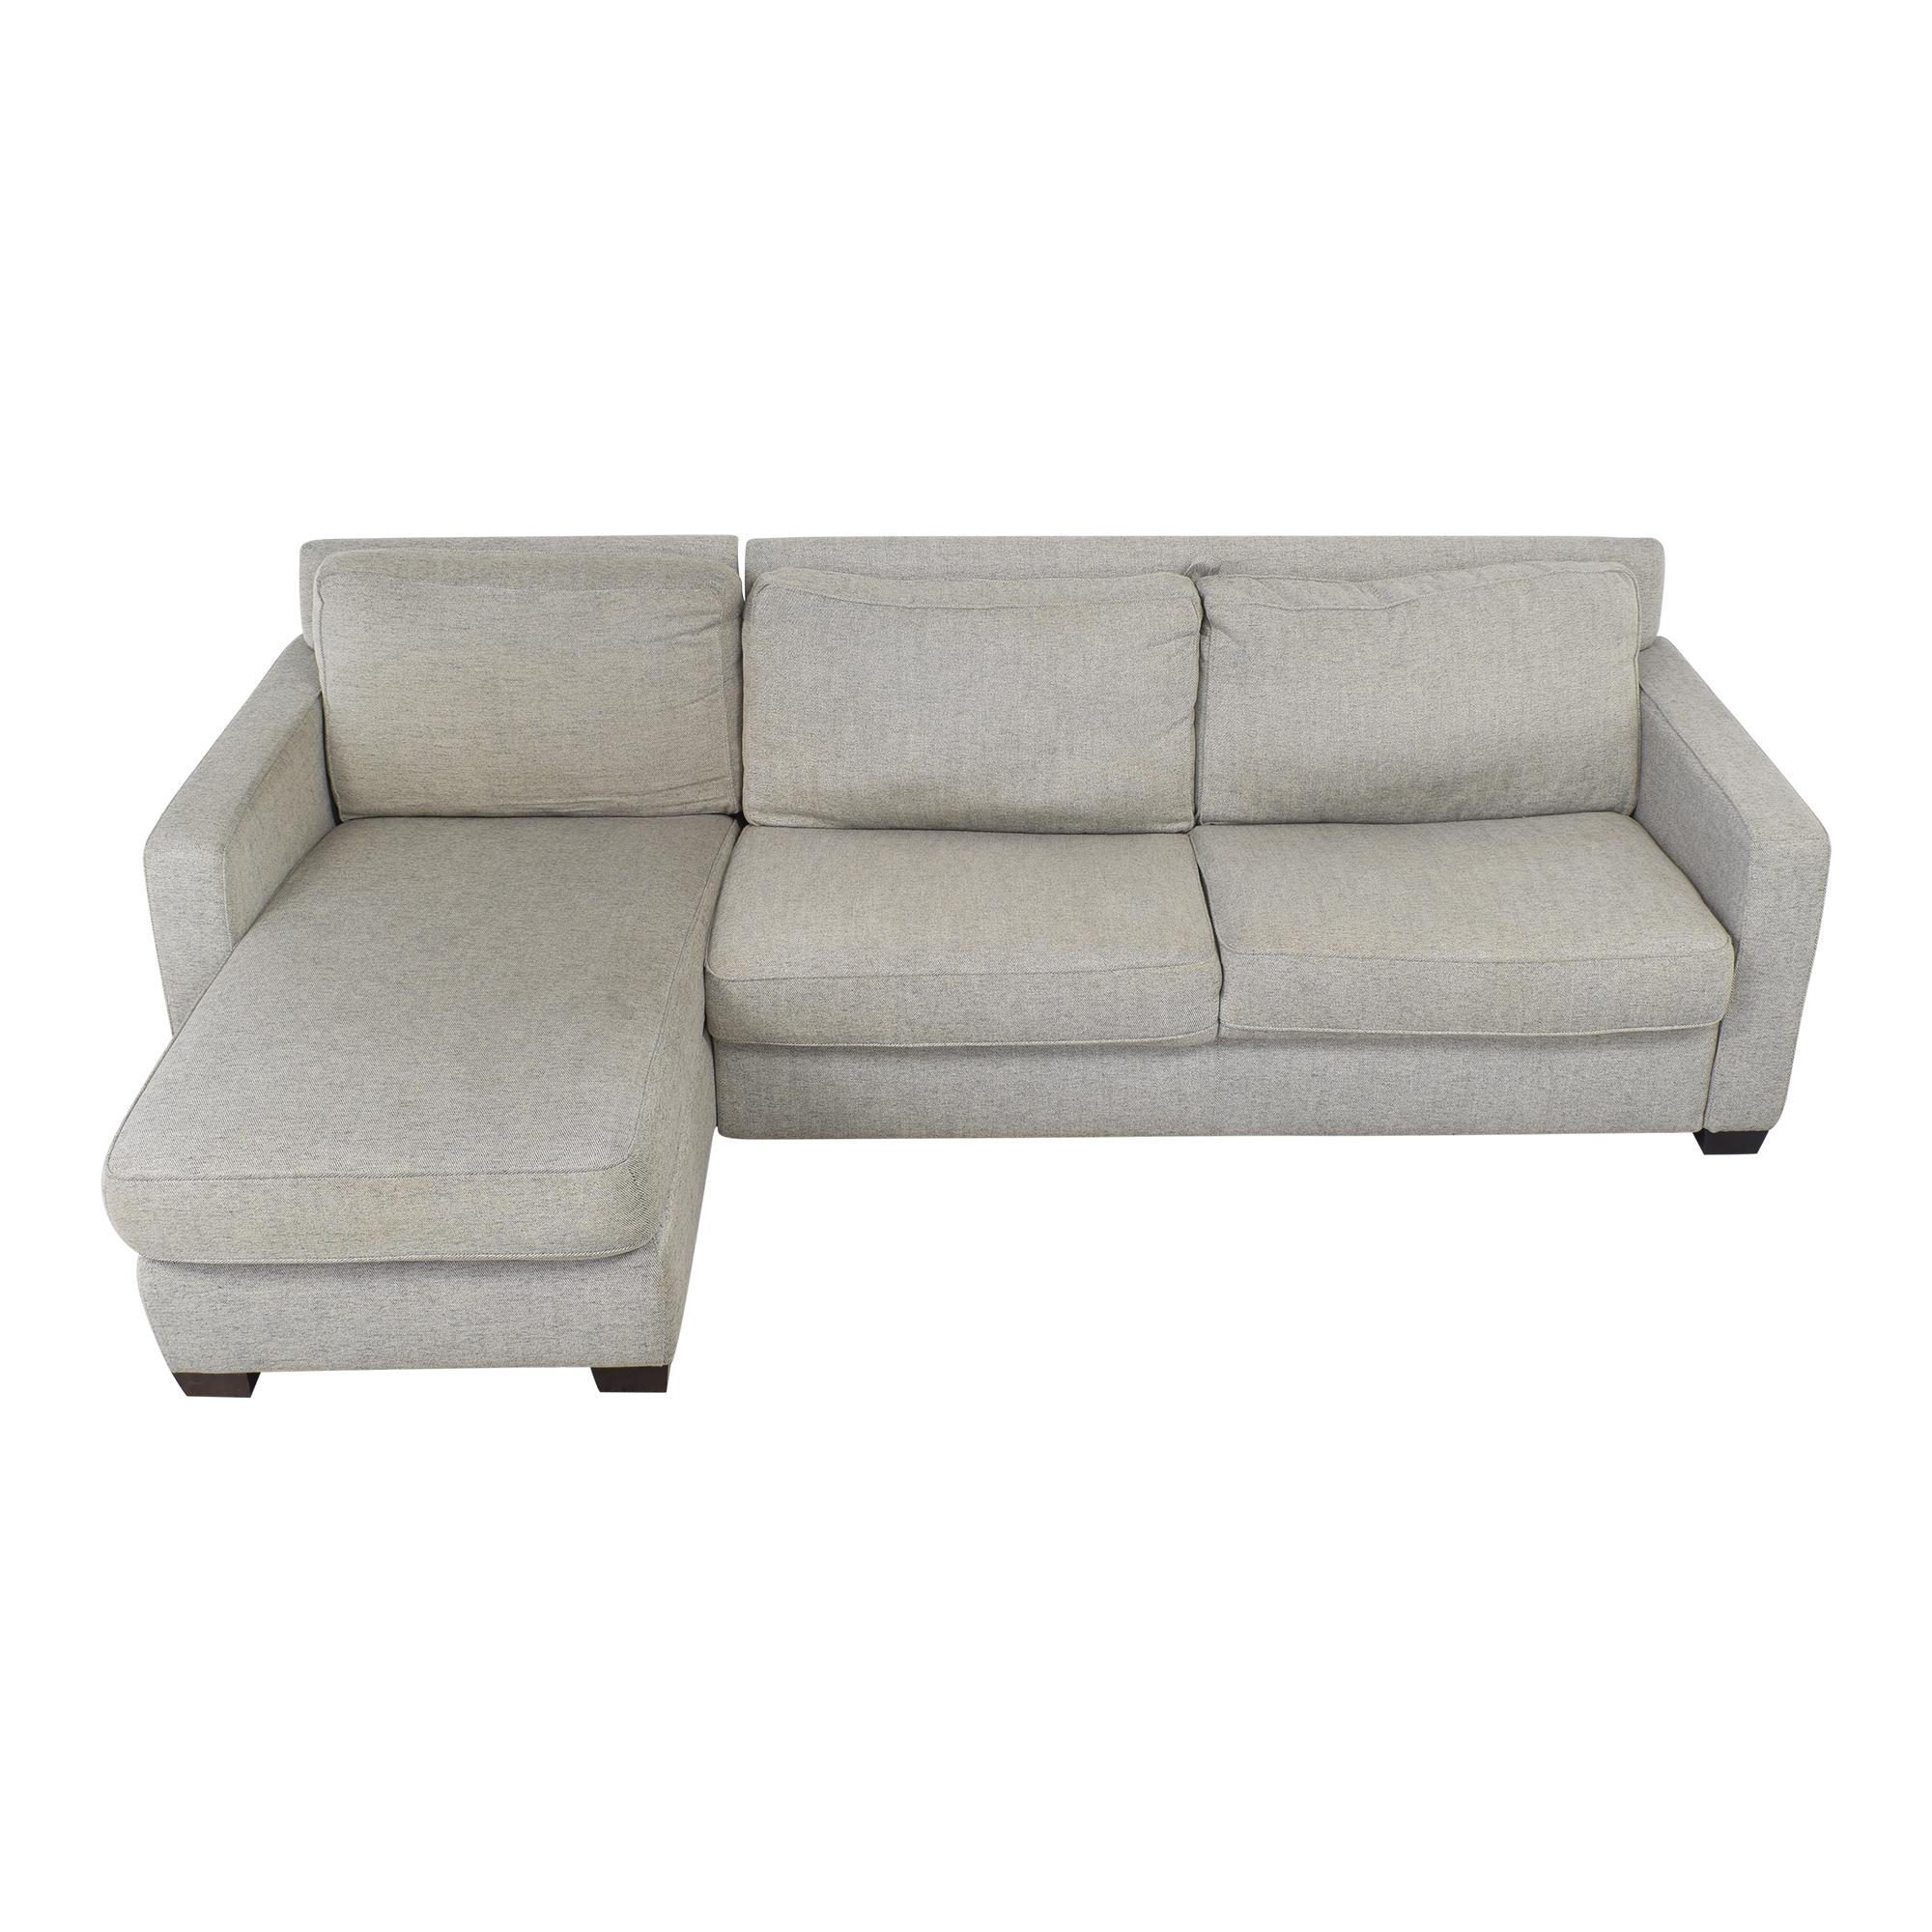 West Elm West Elm Henry 2 Piece Full Sleeper Storage Sofa Sectionals